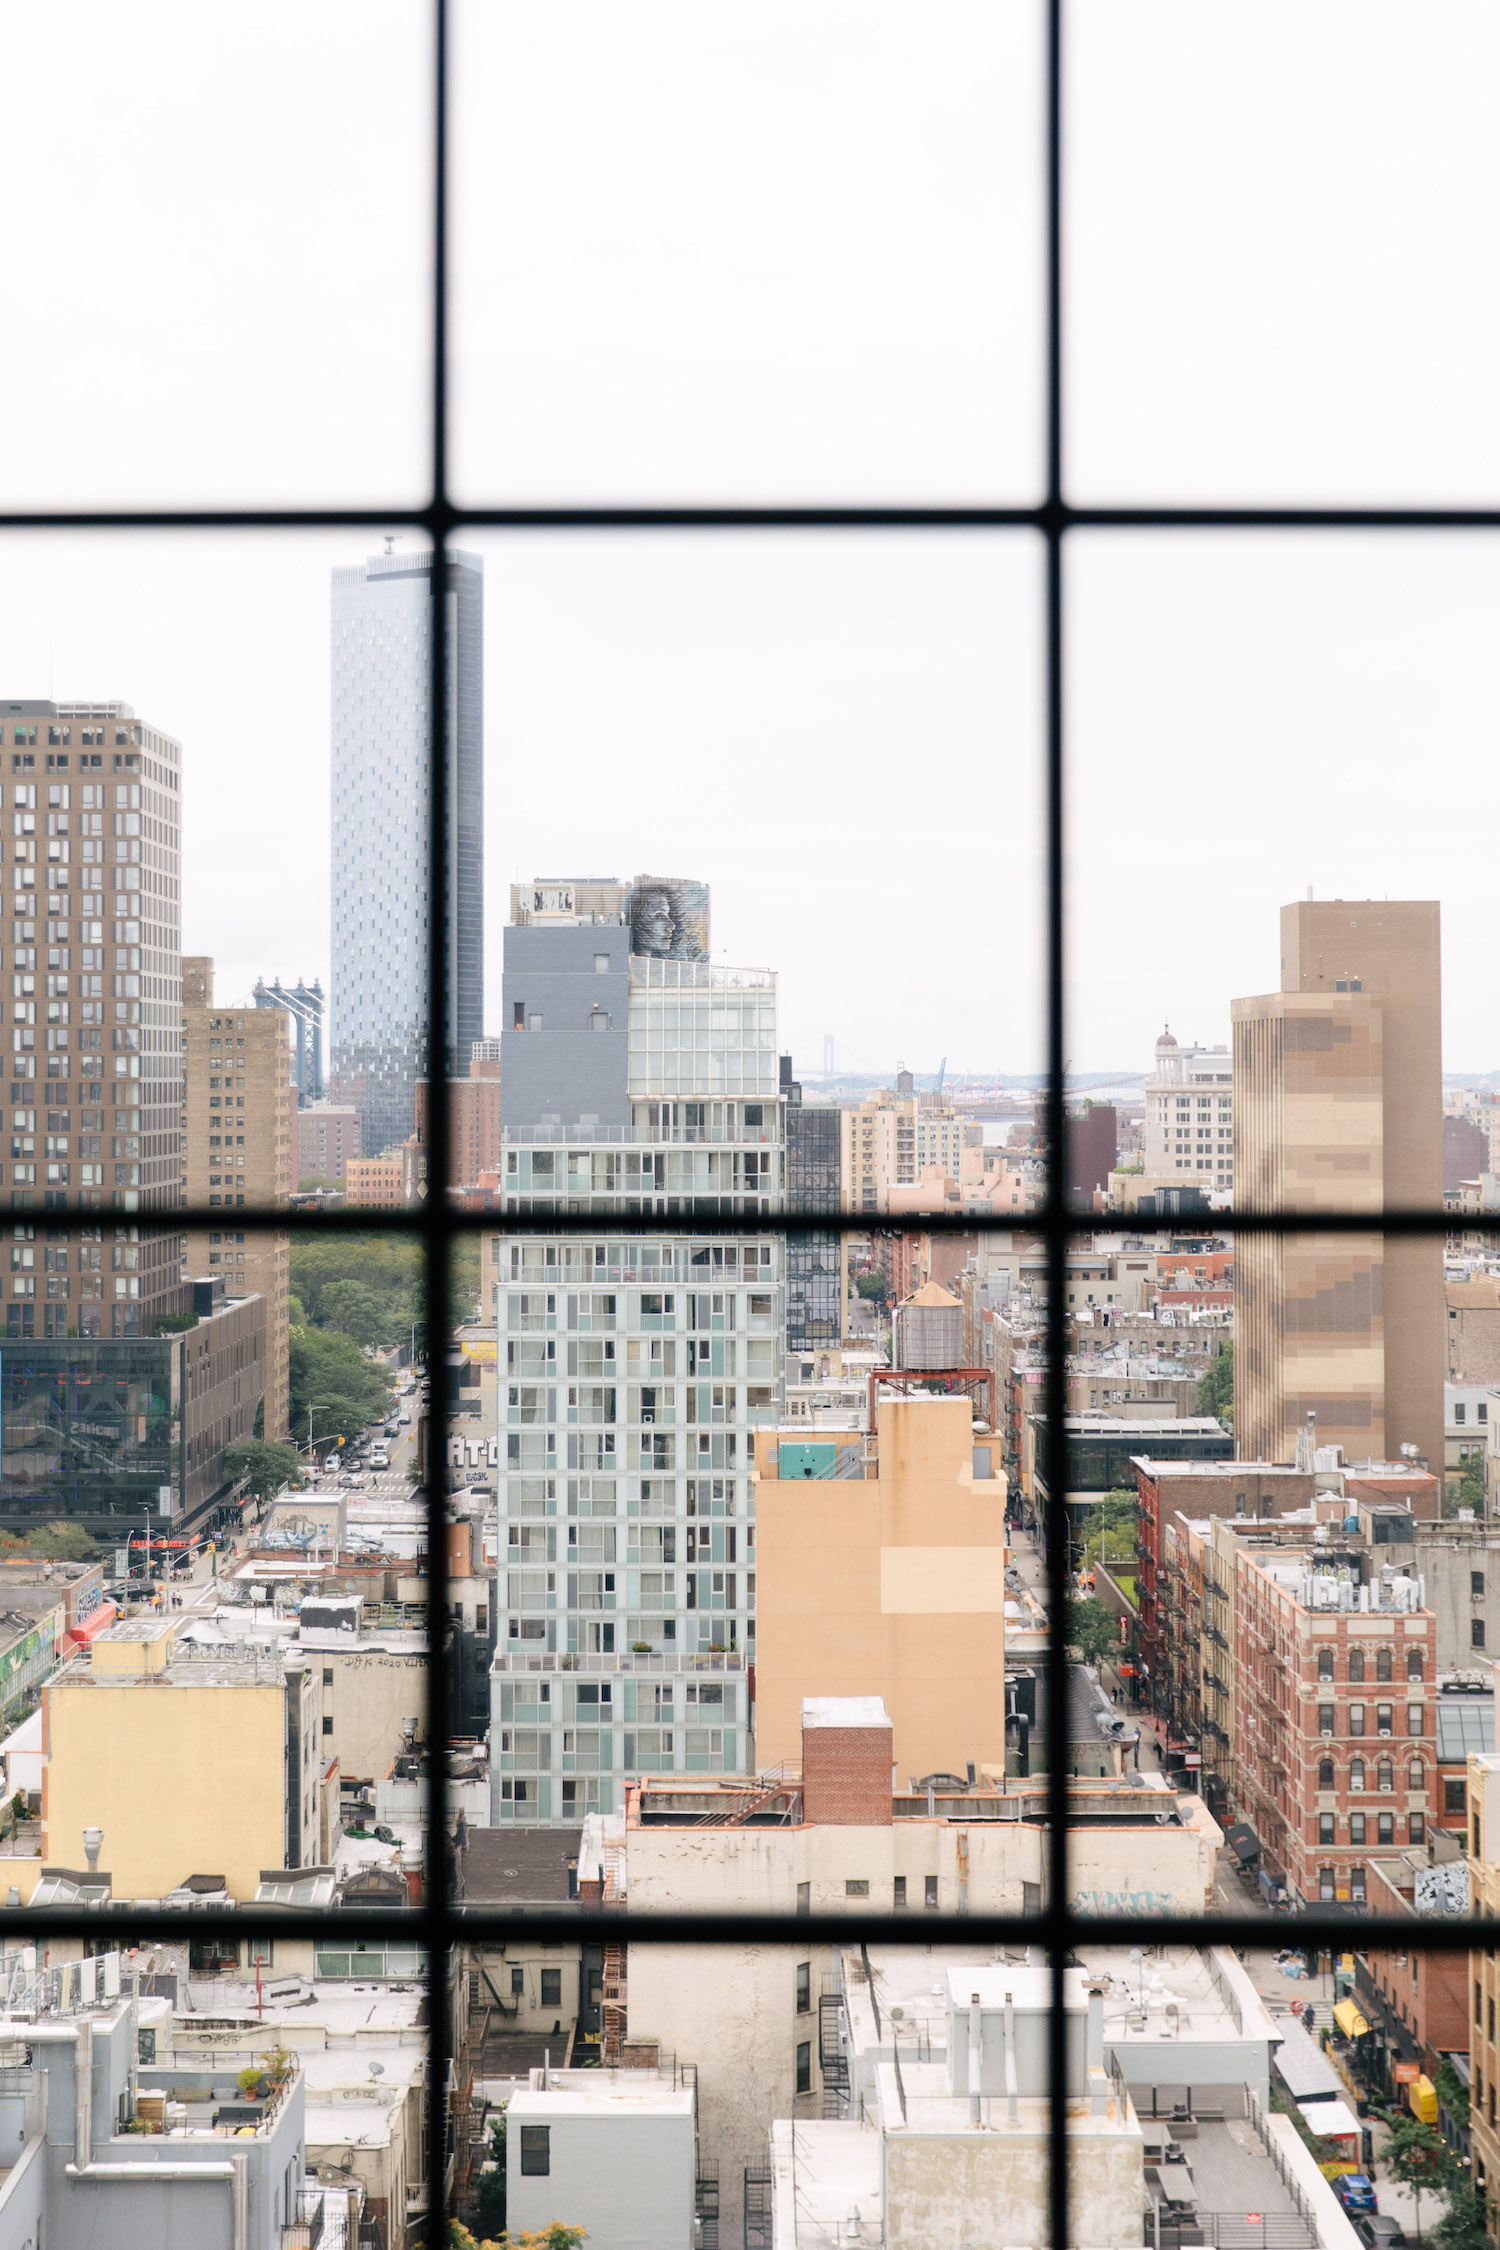 New York Hotels 2021